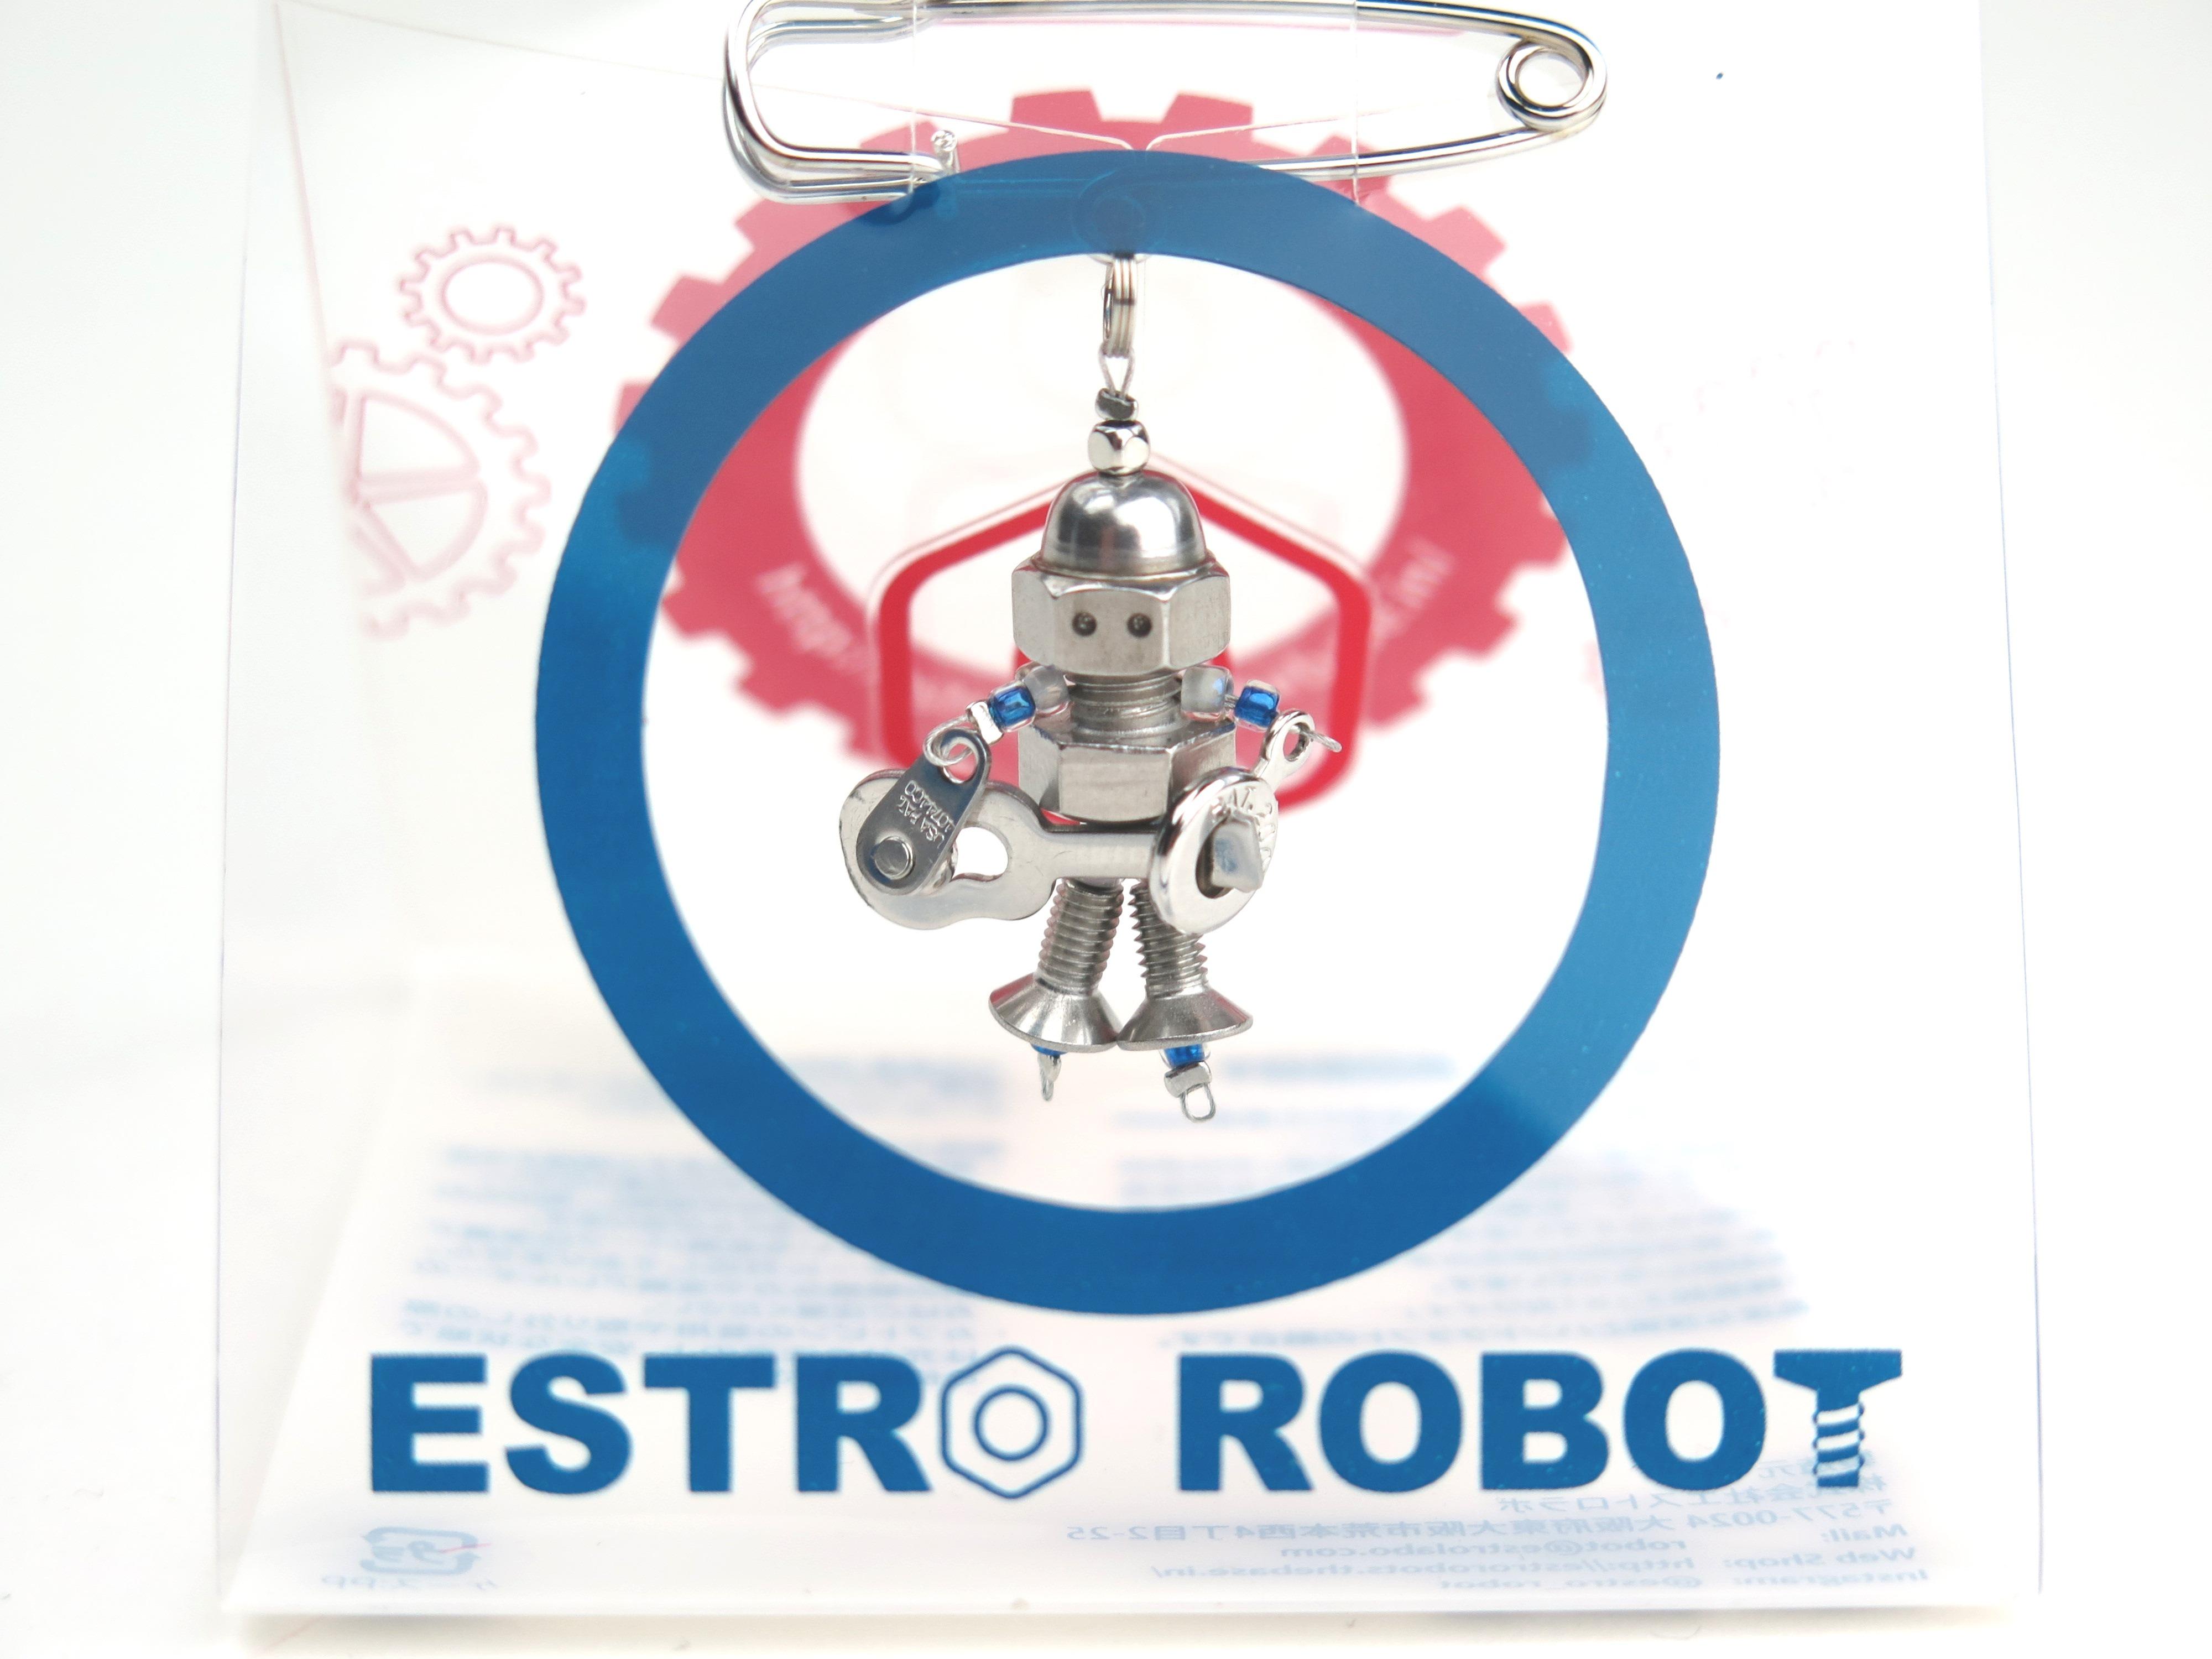 estro robot guitar blue ギター ブルー